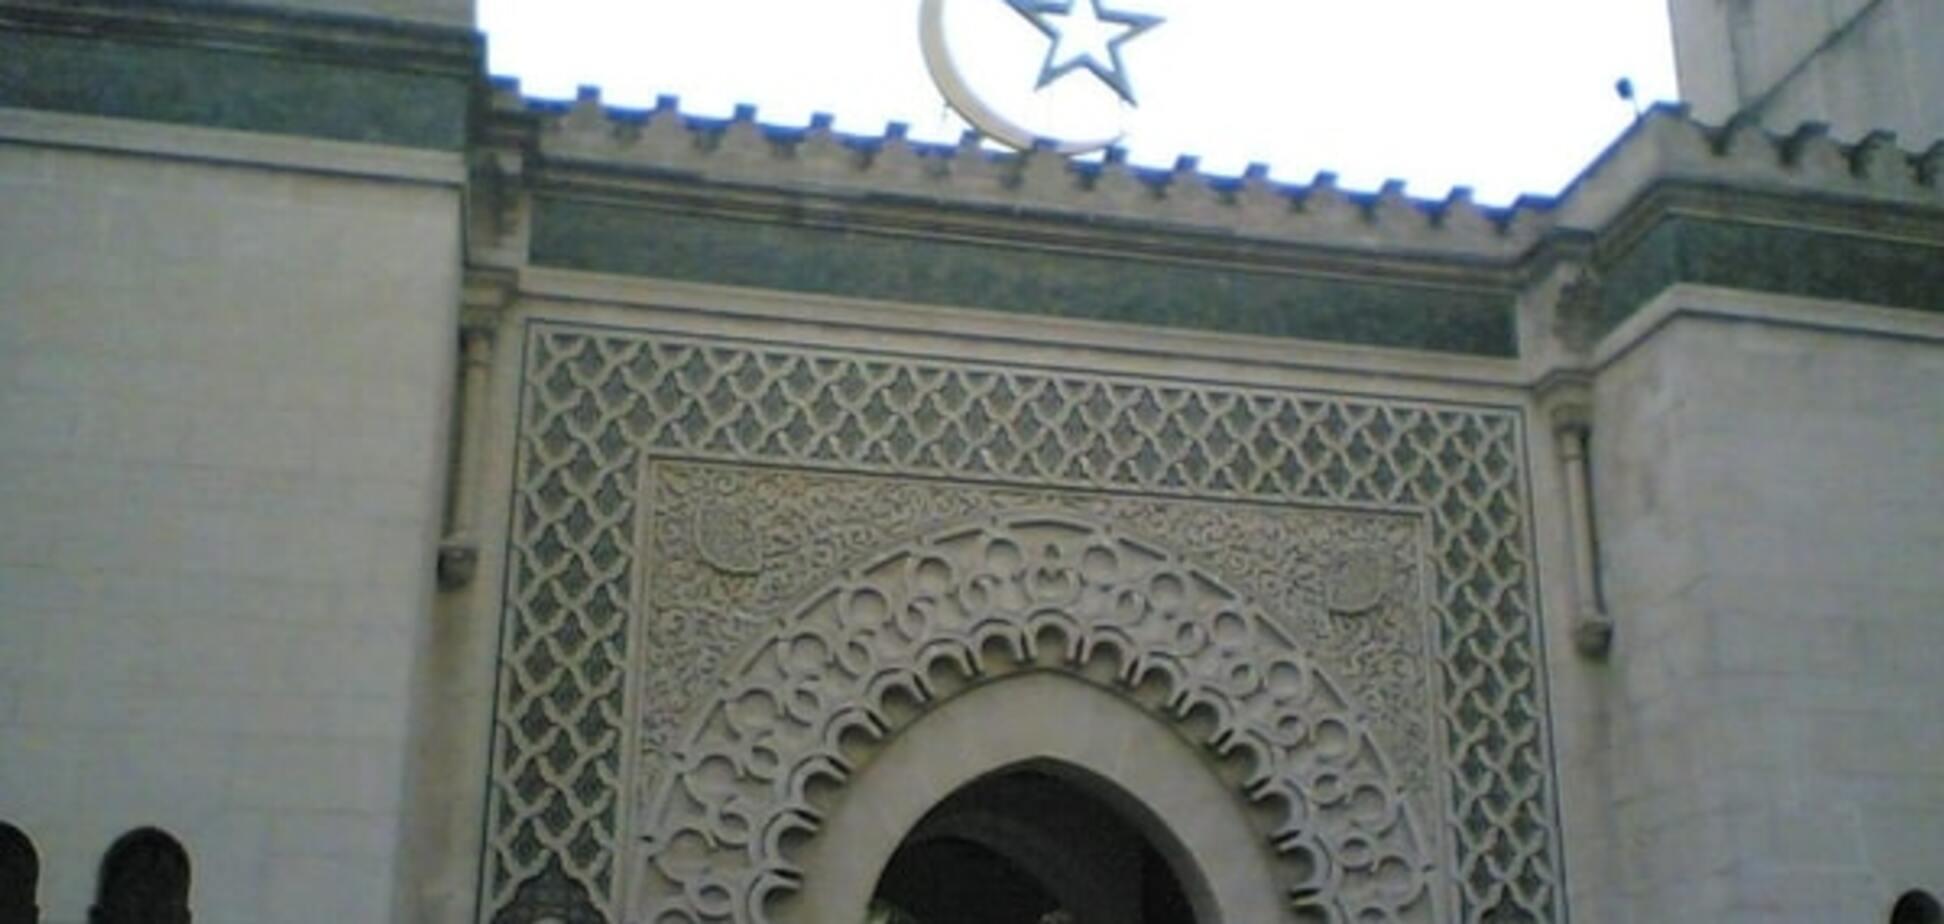 Теракты в Париже: во Франции 'забанили' три мечети